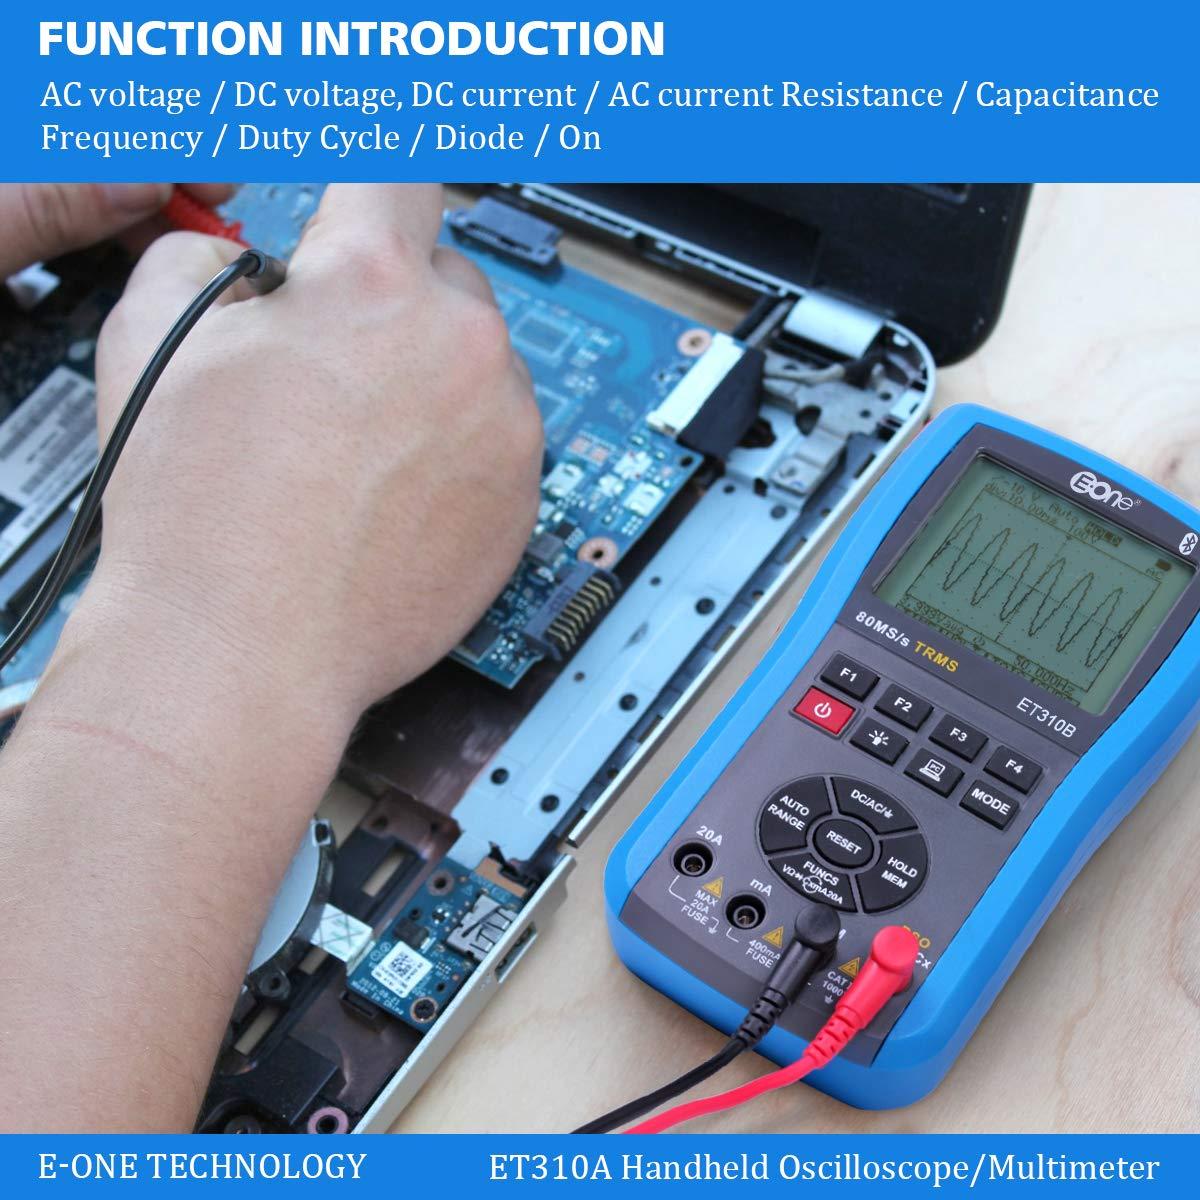 EONE Bluetooth Osciloscopio Mult/ímetro Ohmmetros 3 en 1 Manual autom/ática DC//AC voltaje corriente resistencia frecuencia de capacitancia; prueba diodos transistores con retroiluminaci/ón LED Tester